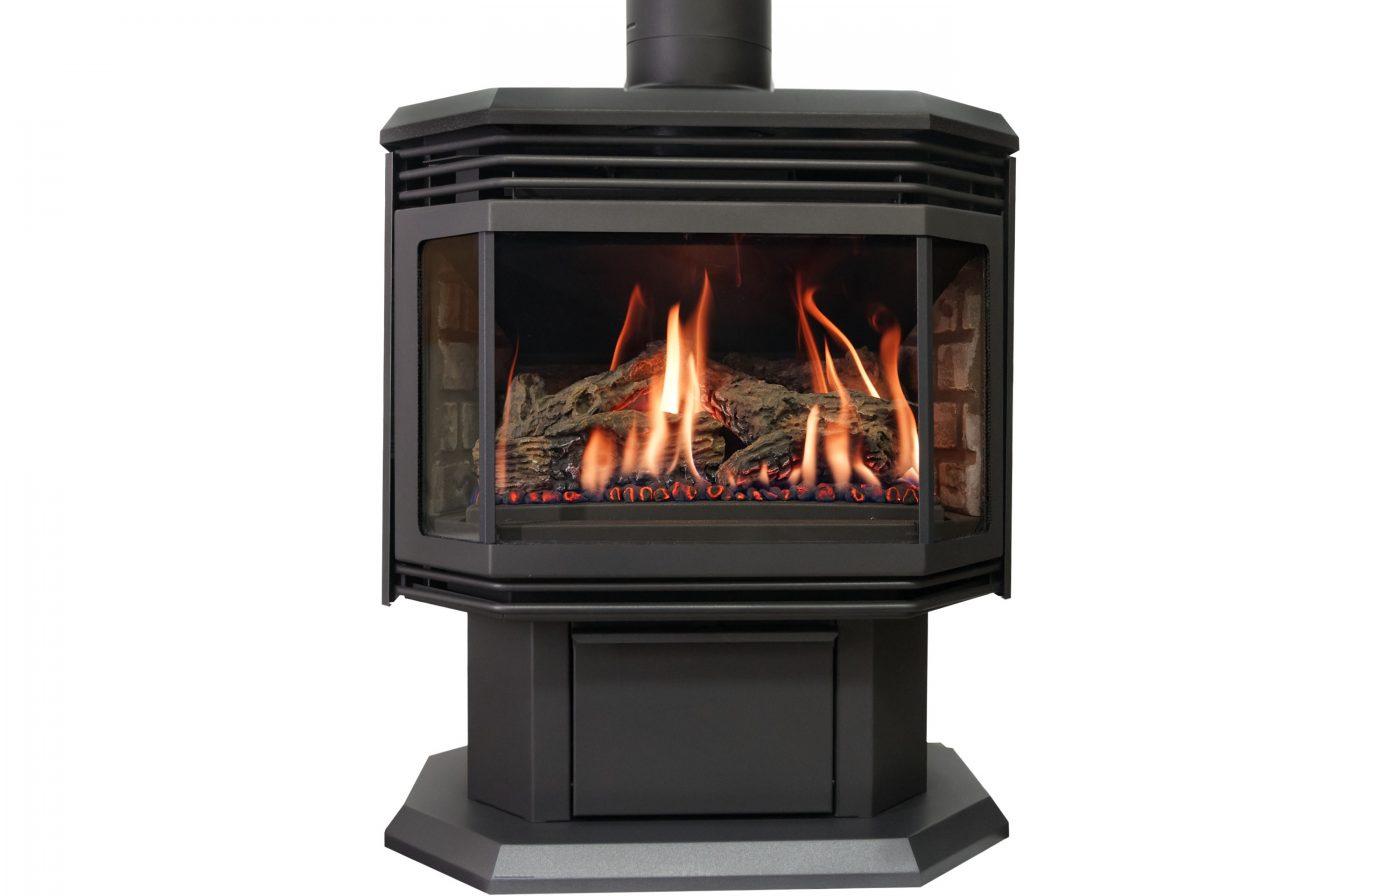 lynnwood wa fireplace Archgard 45 freestanding black